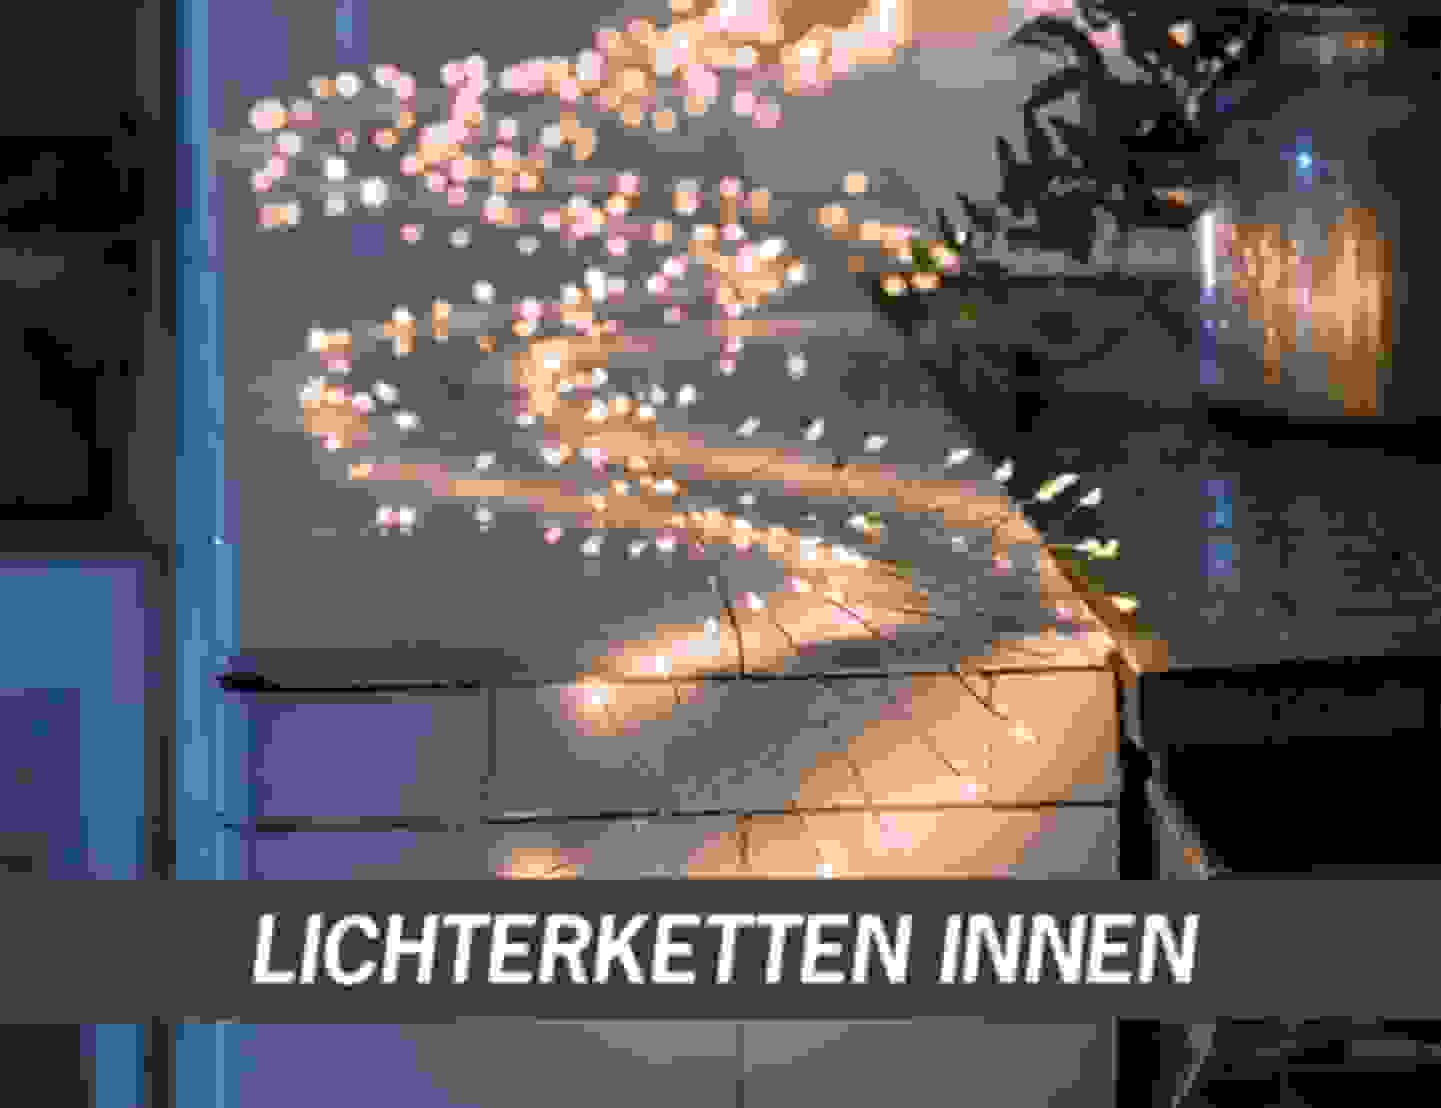 Lichterketten innen